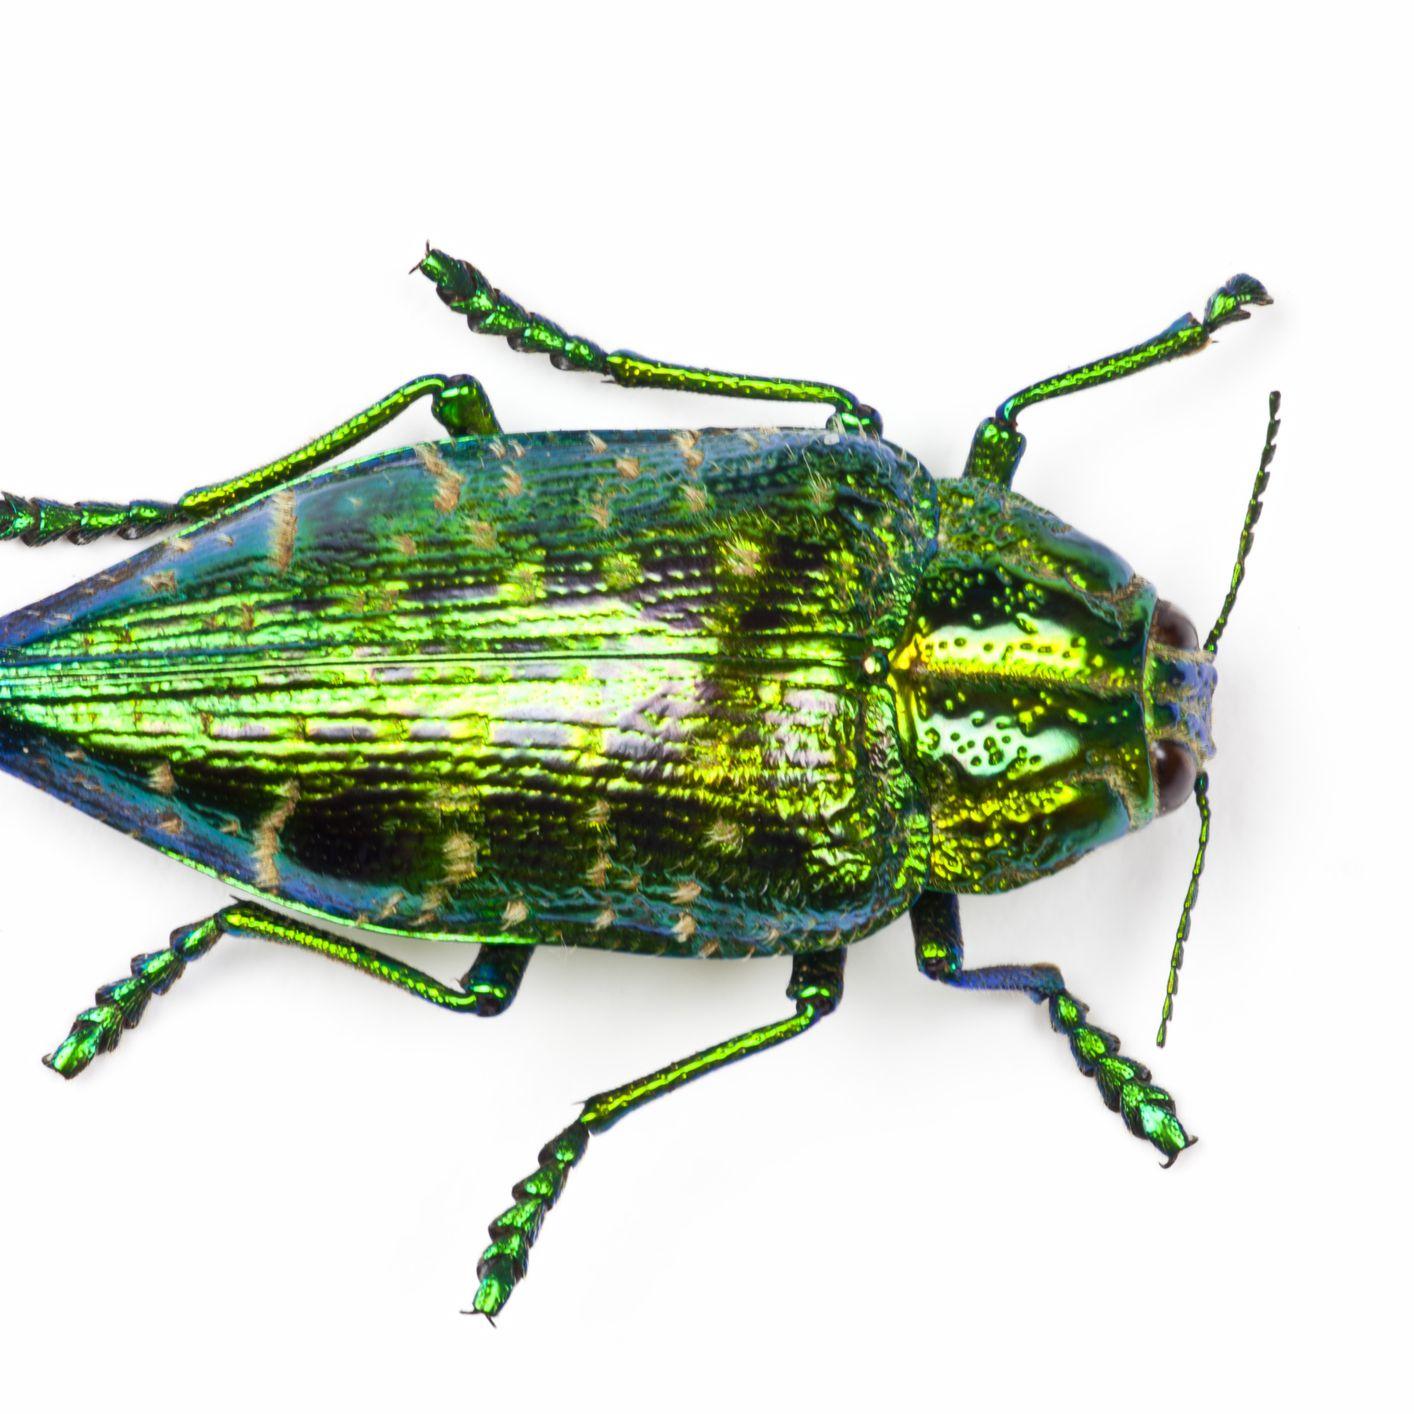 Jewel Beetles: Life Cycle, Habits, and Traits